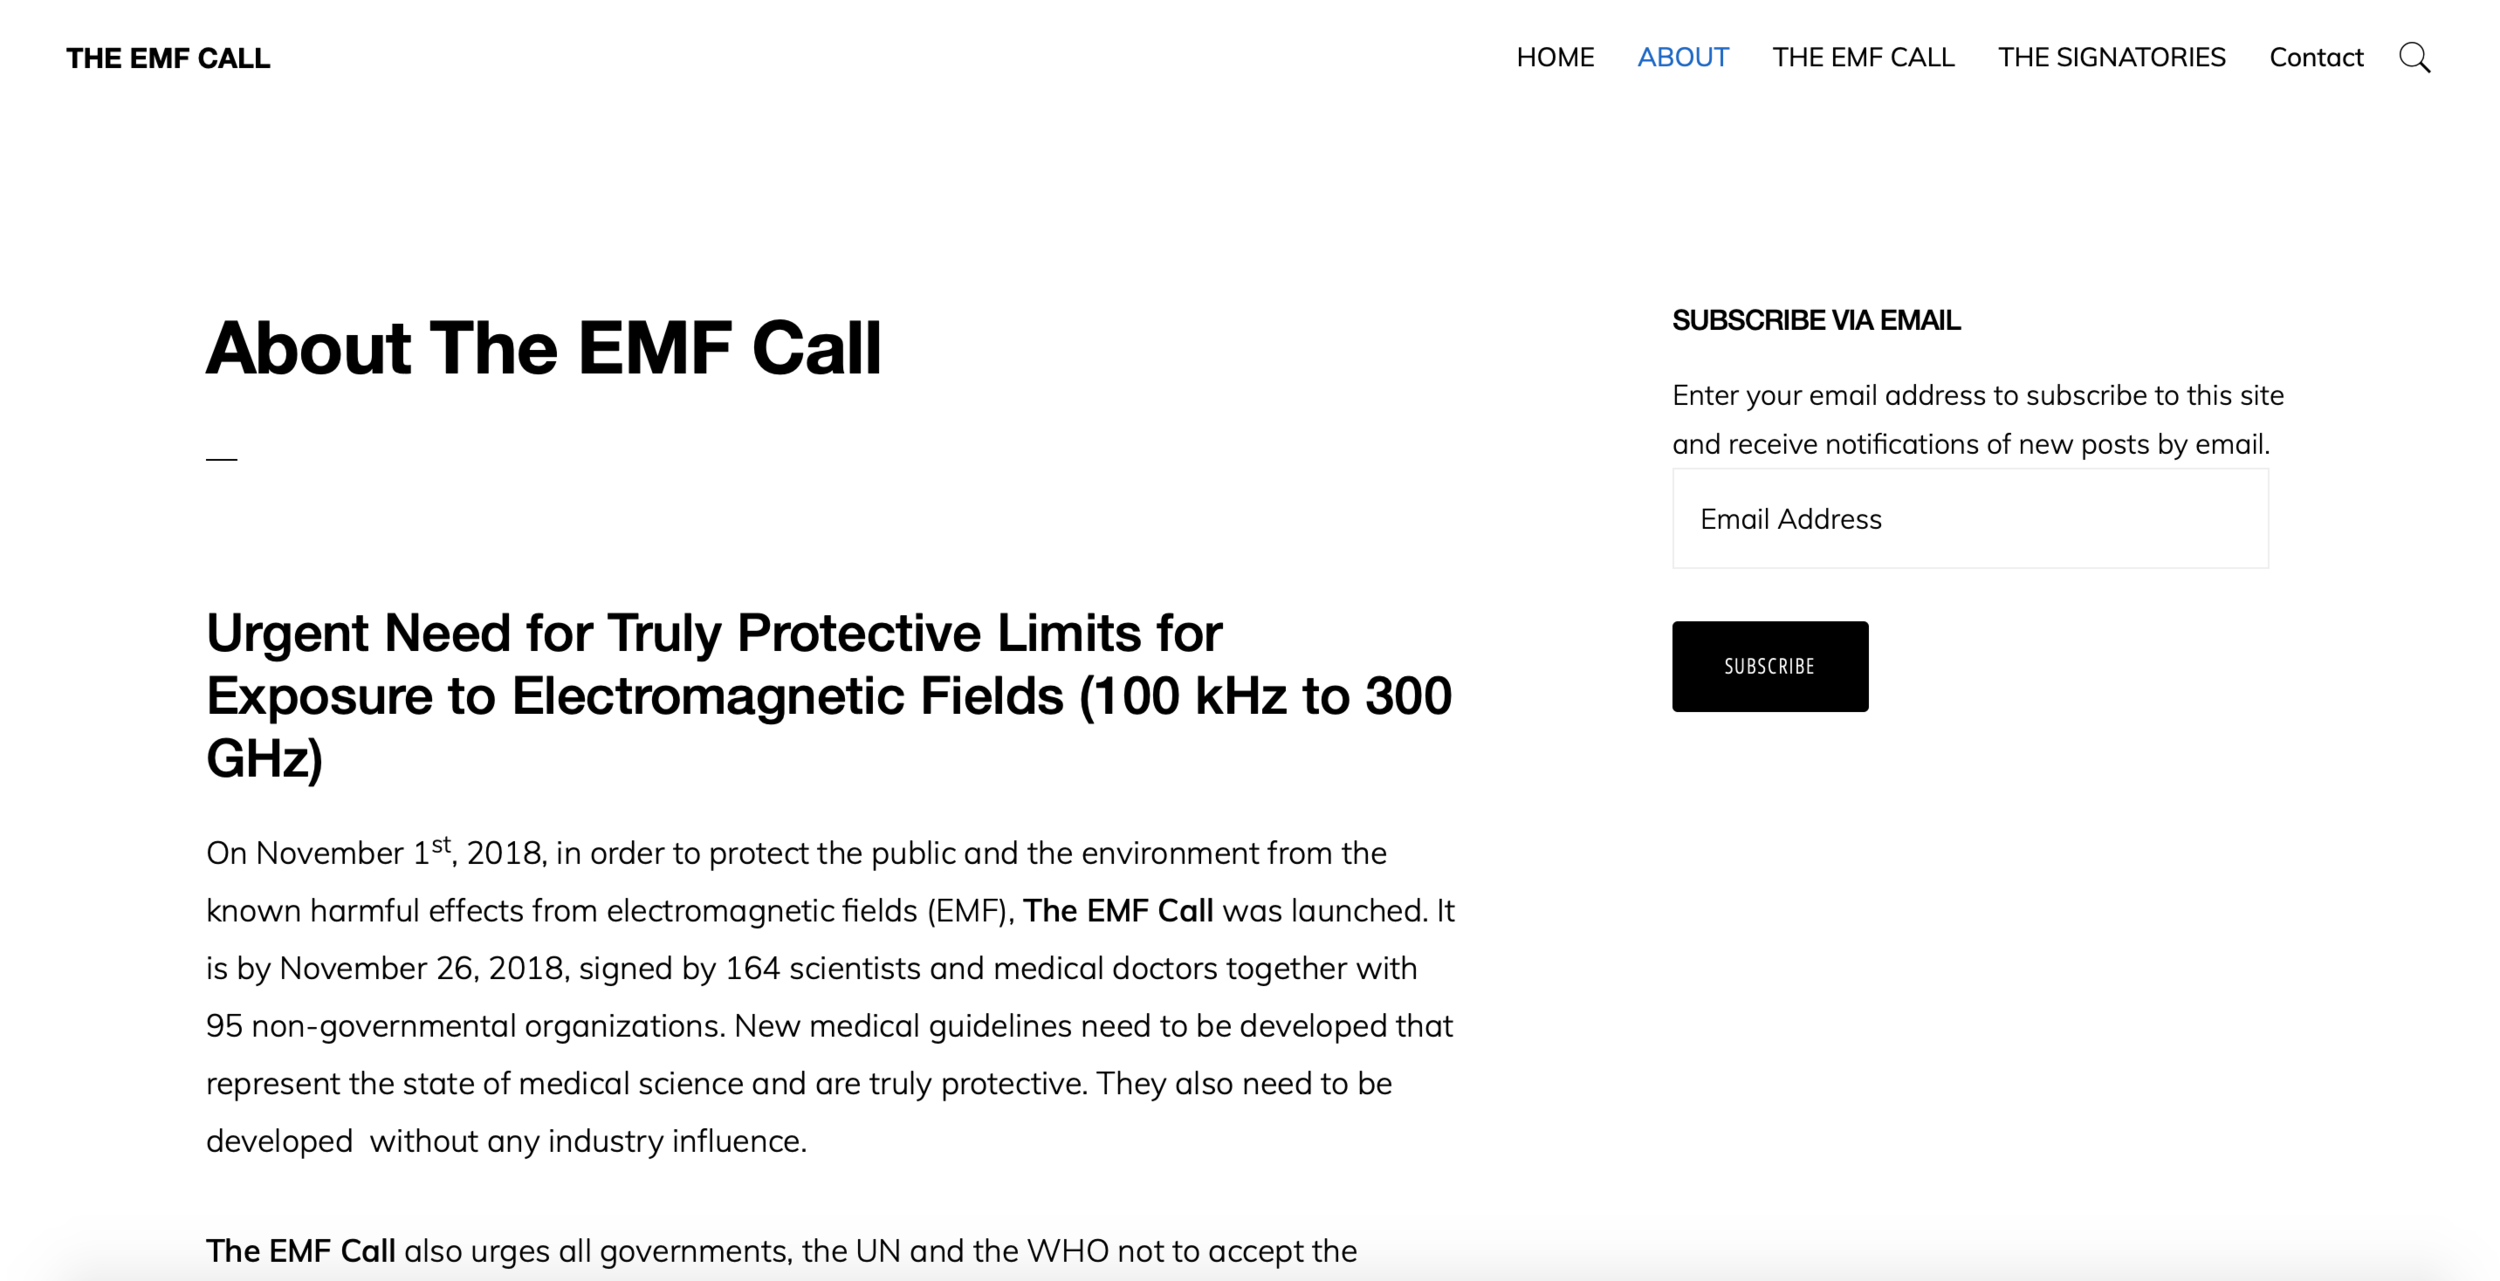 EMF Call